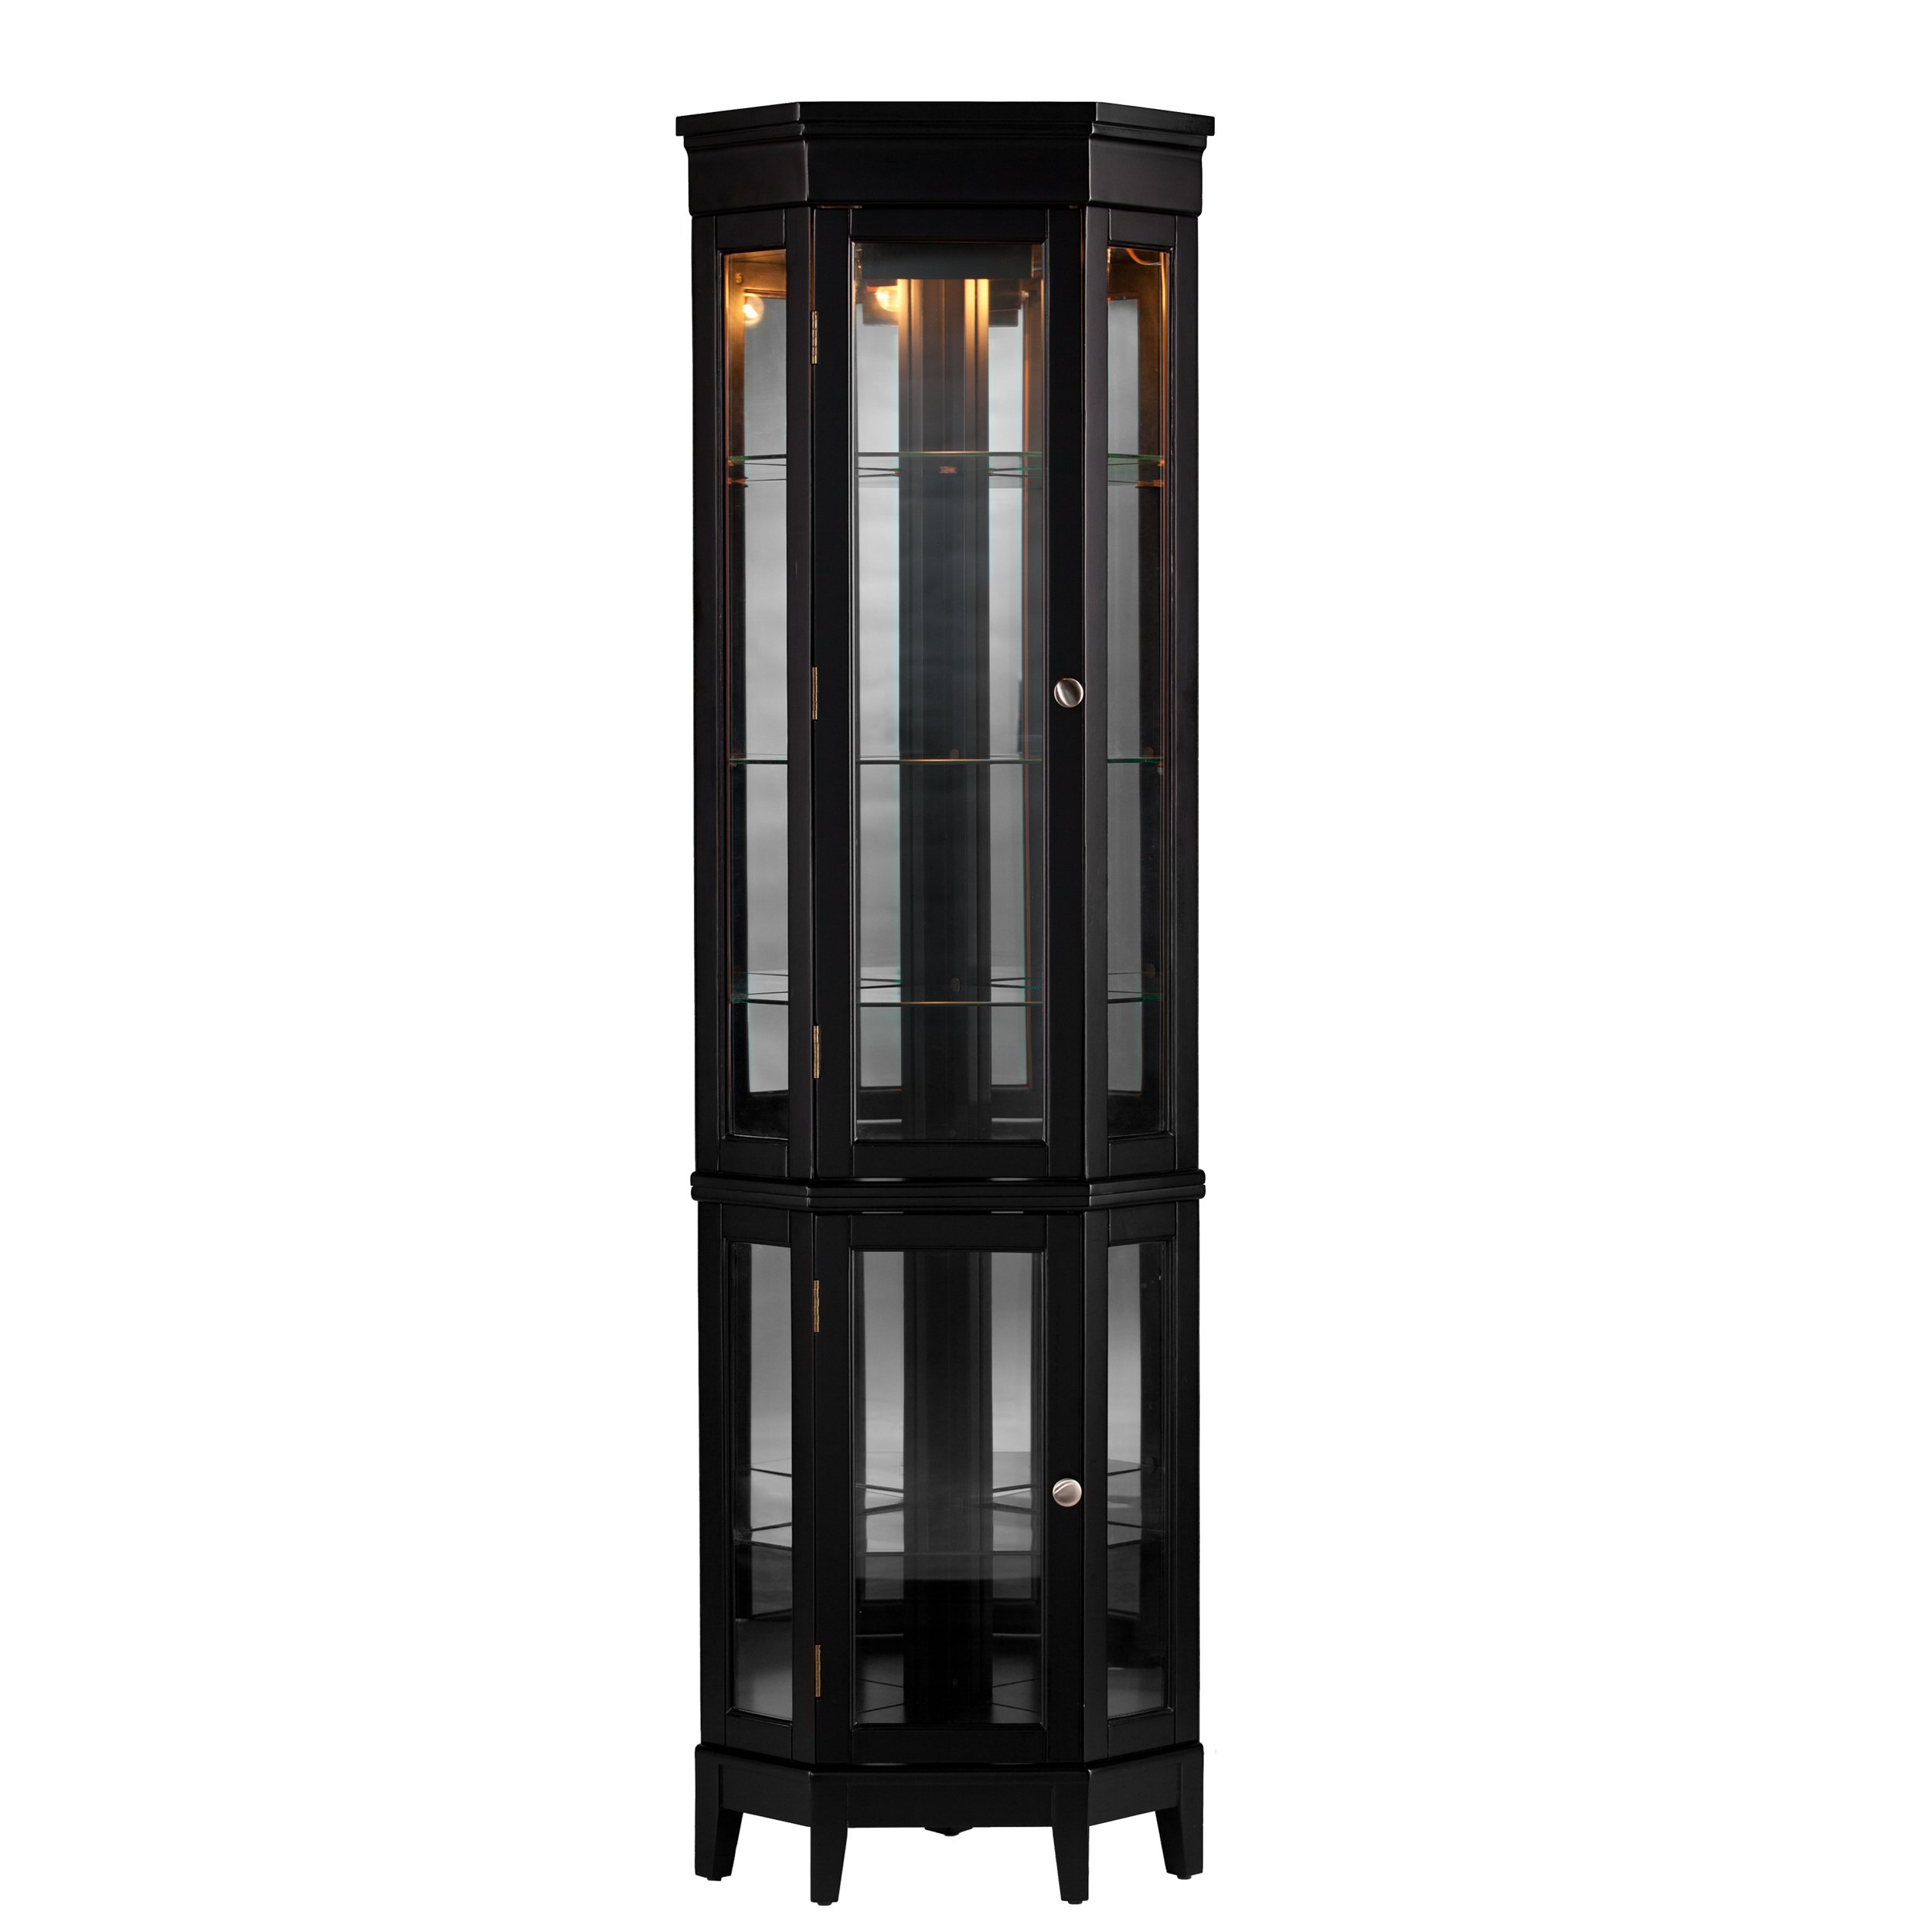 Essex Corner Curio Cabinet - Adjustable Glass Shelves - 2 Tier w/ Black Finish by Southern Enterprises